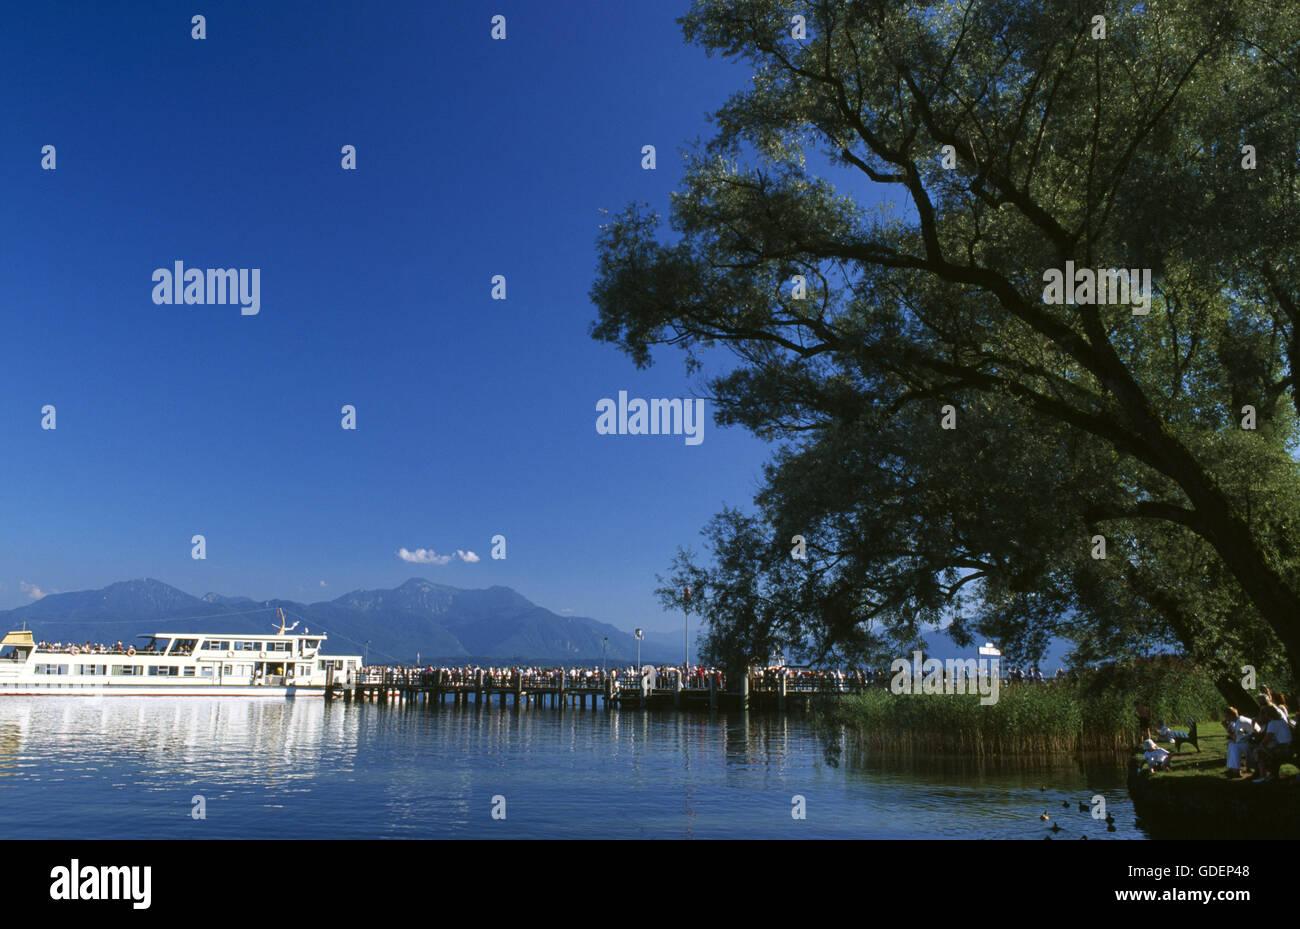 Frauenchiemsee, Lake Chiemsee, Chiemgau, Bavaria, Germany Stock Photo